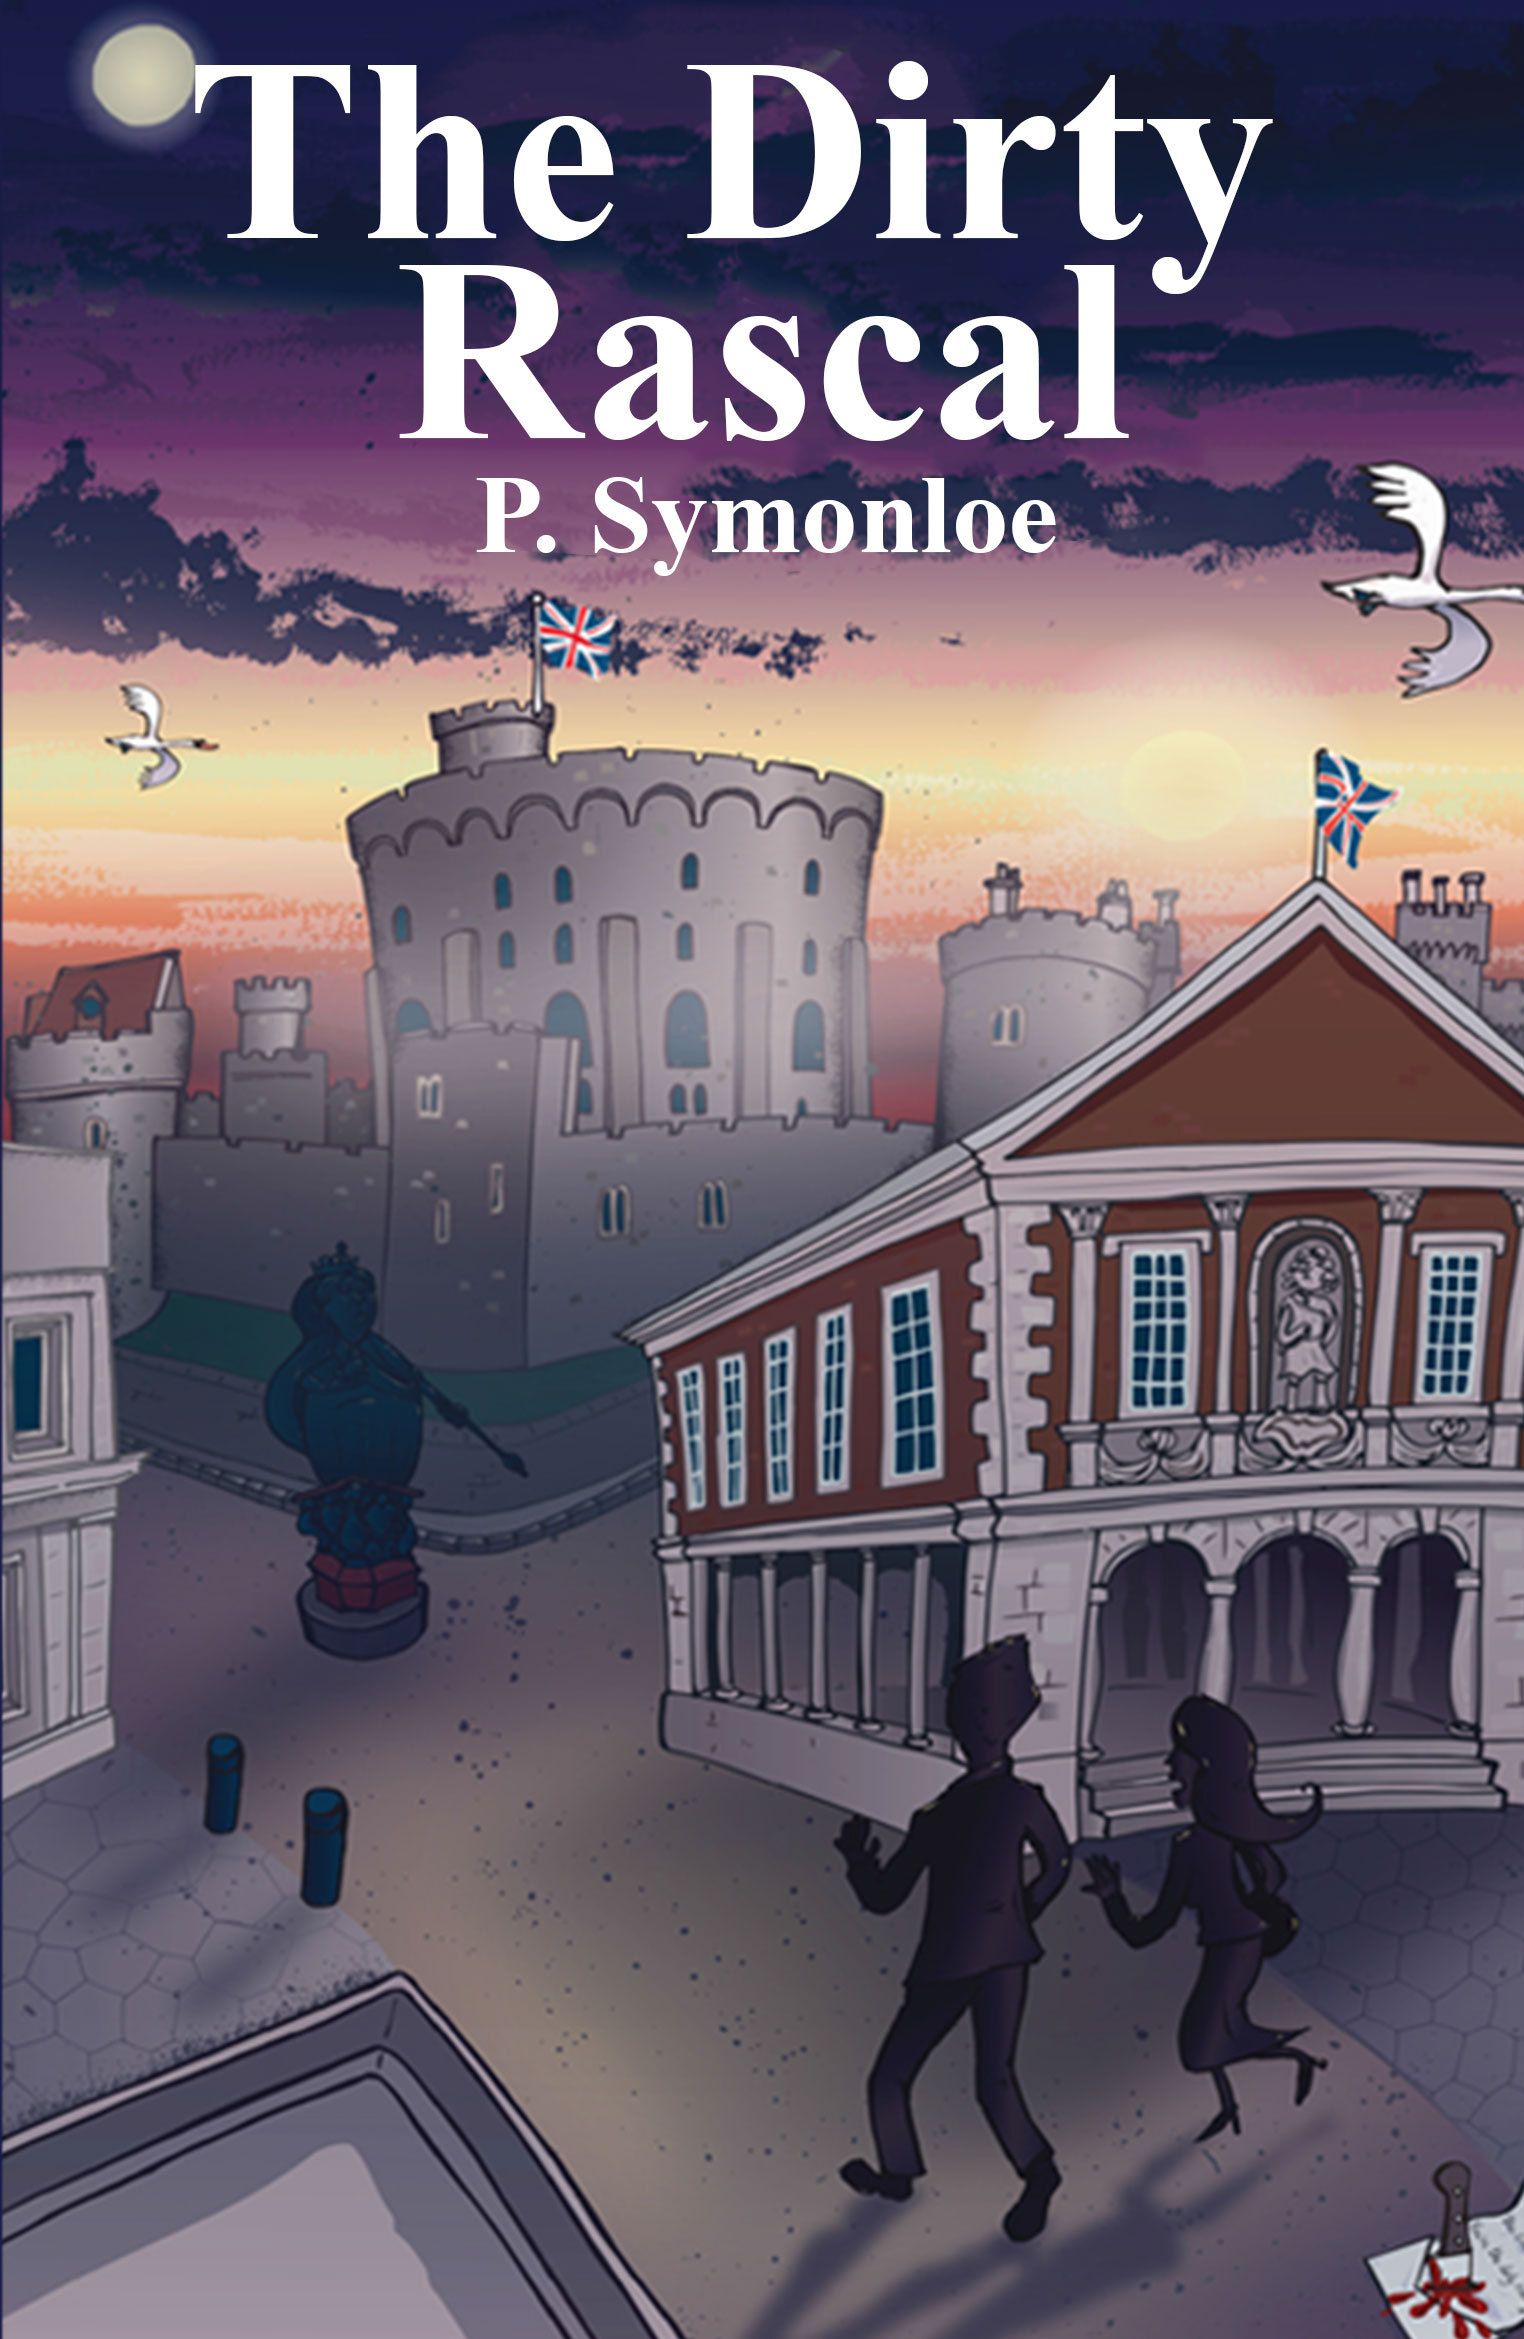 The Dirty Rascal P. Symonloe